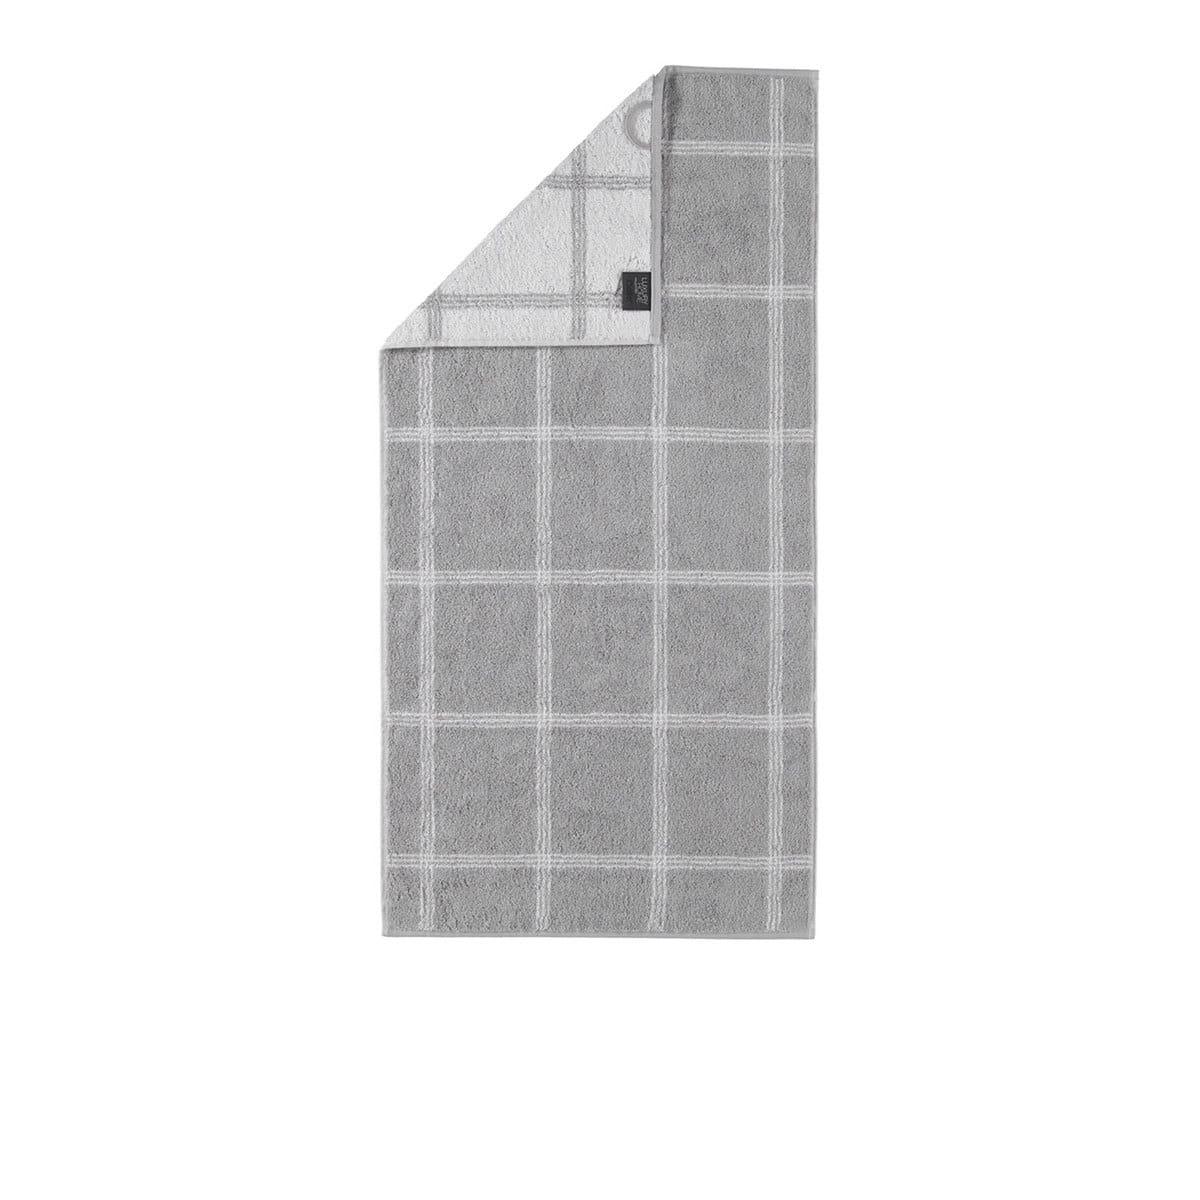 caw handt cher 604 two tone grafik platin g nstig online kaufen bei bettwaren shop. Black Bedroom Furniture Sets. Home Design Ideas